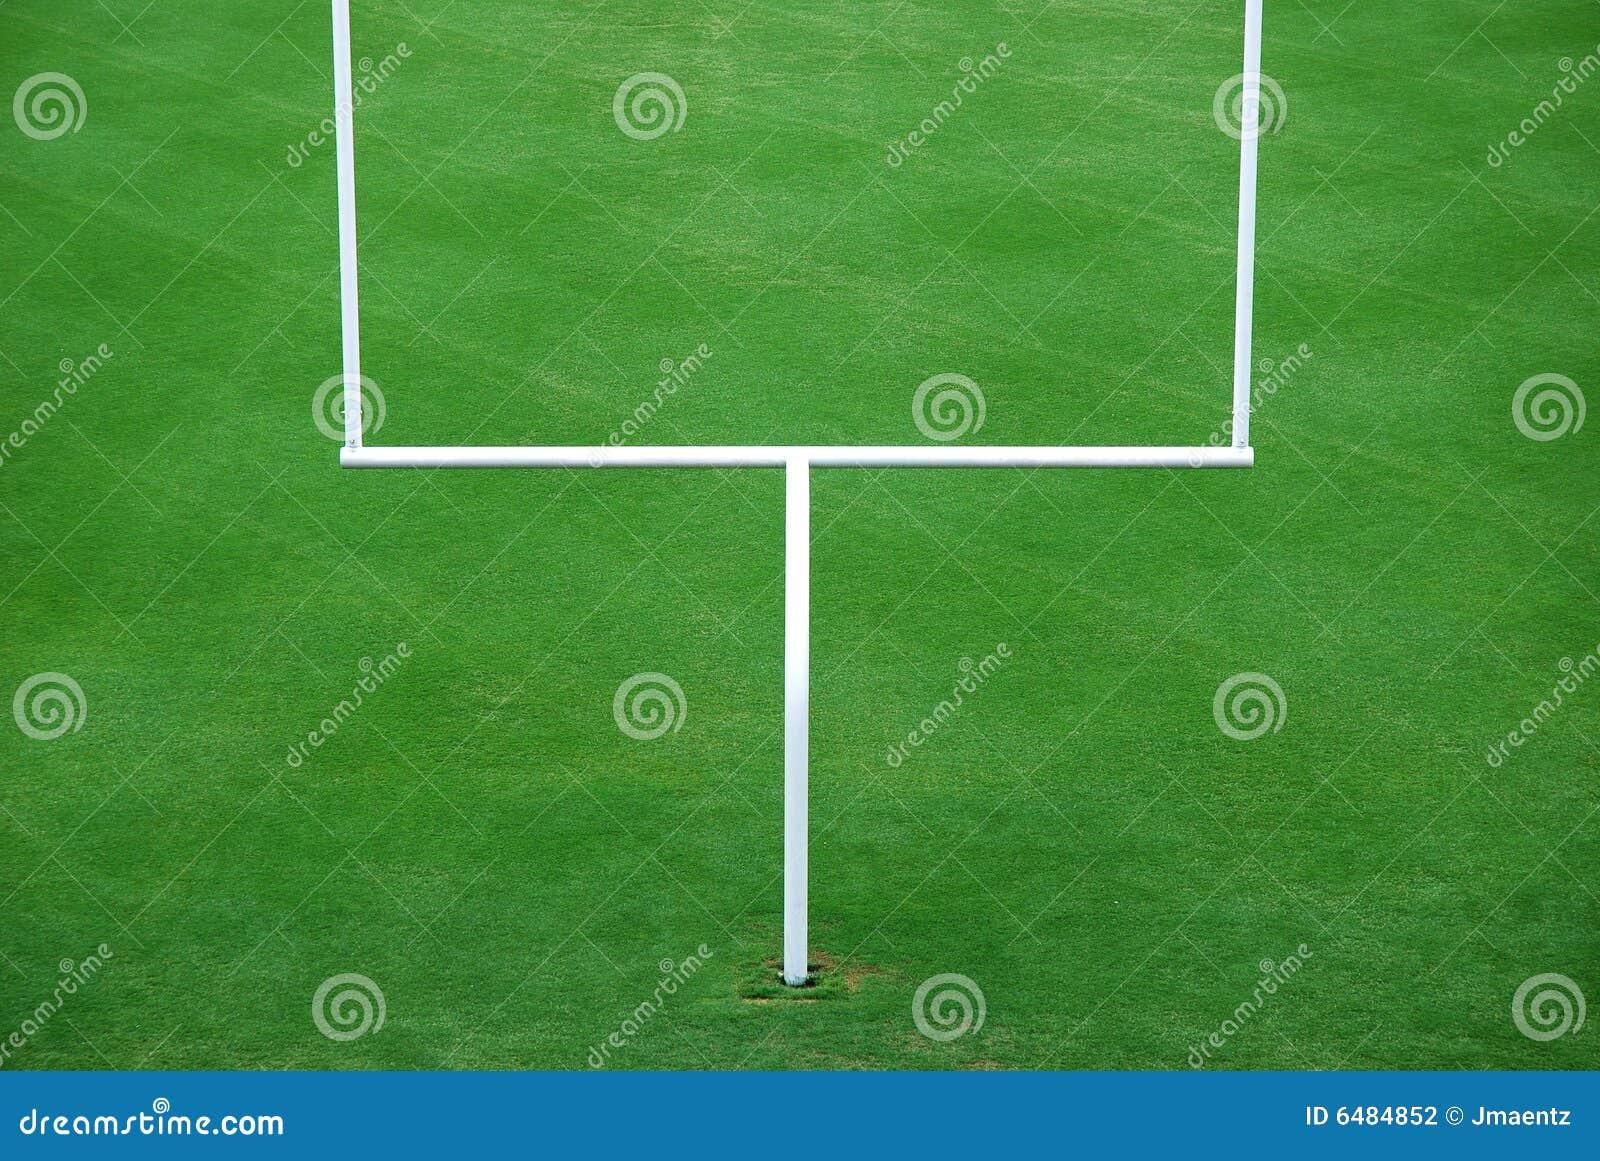 Poteau de football américain